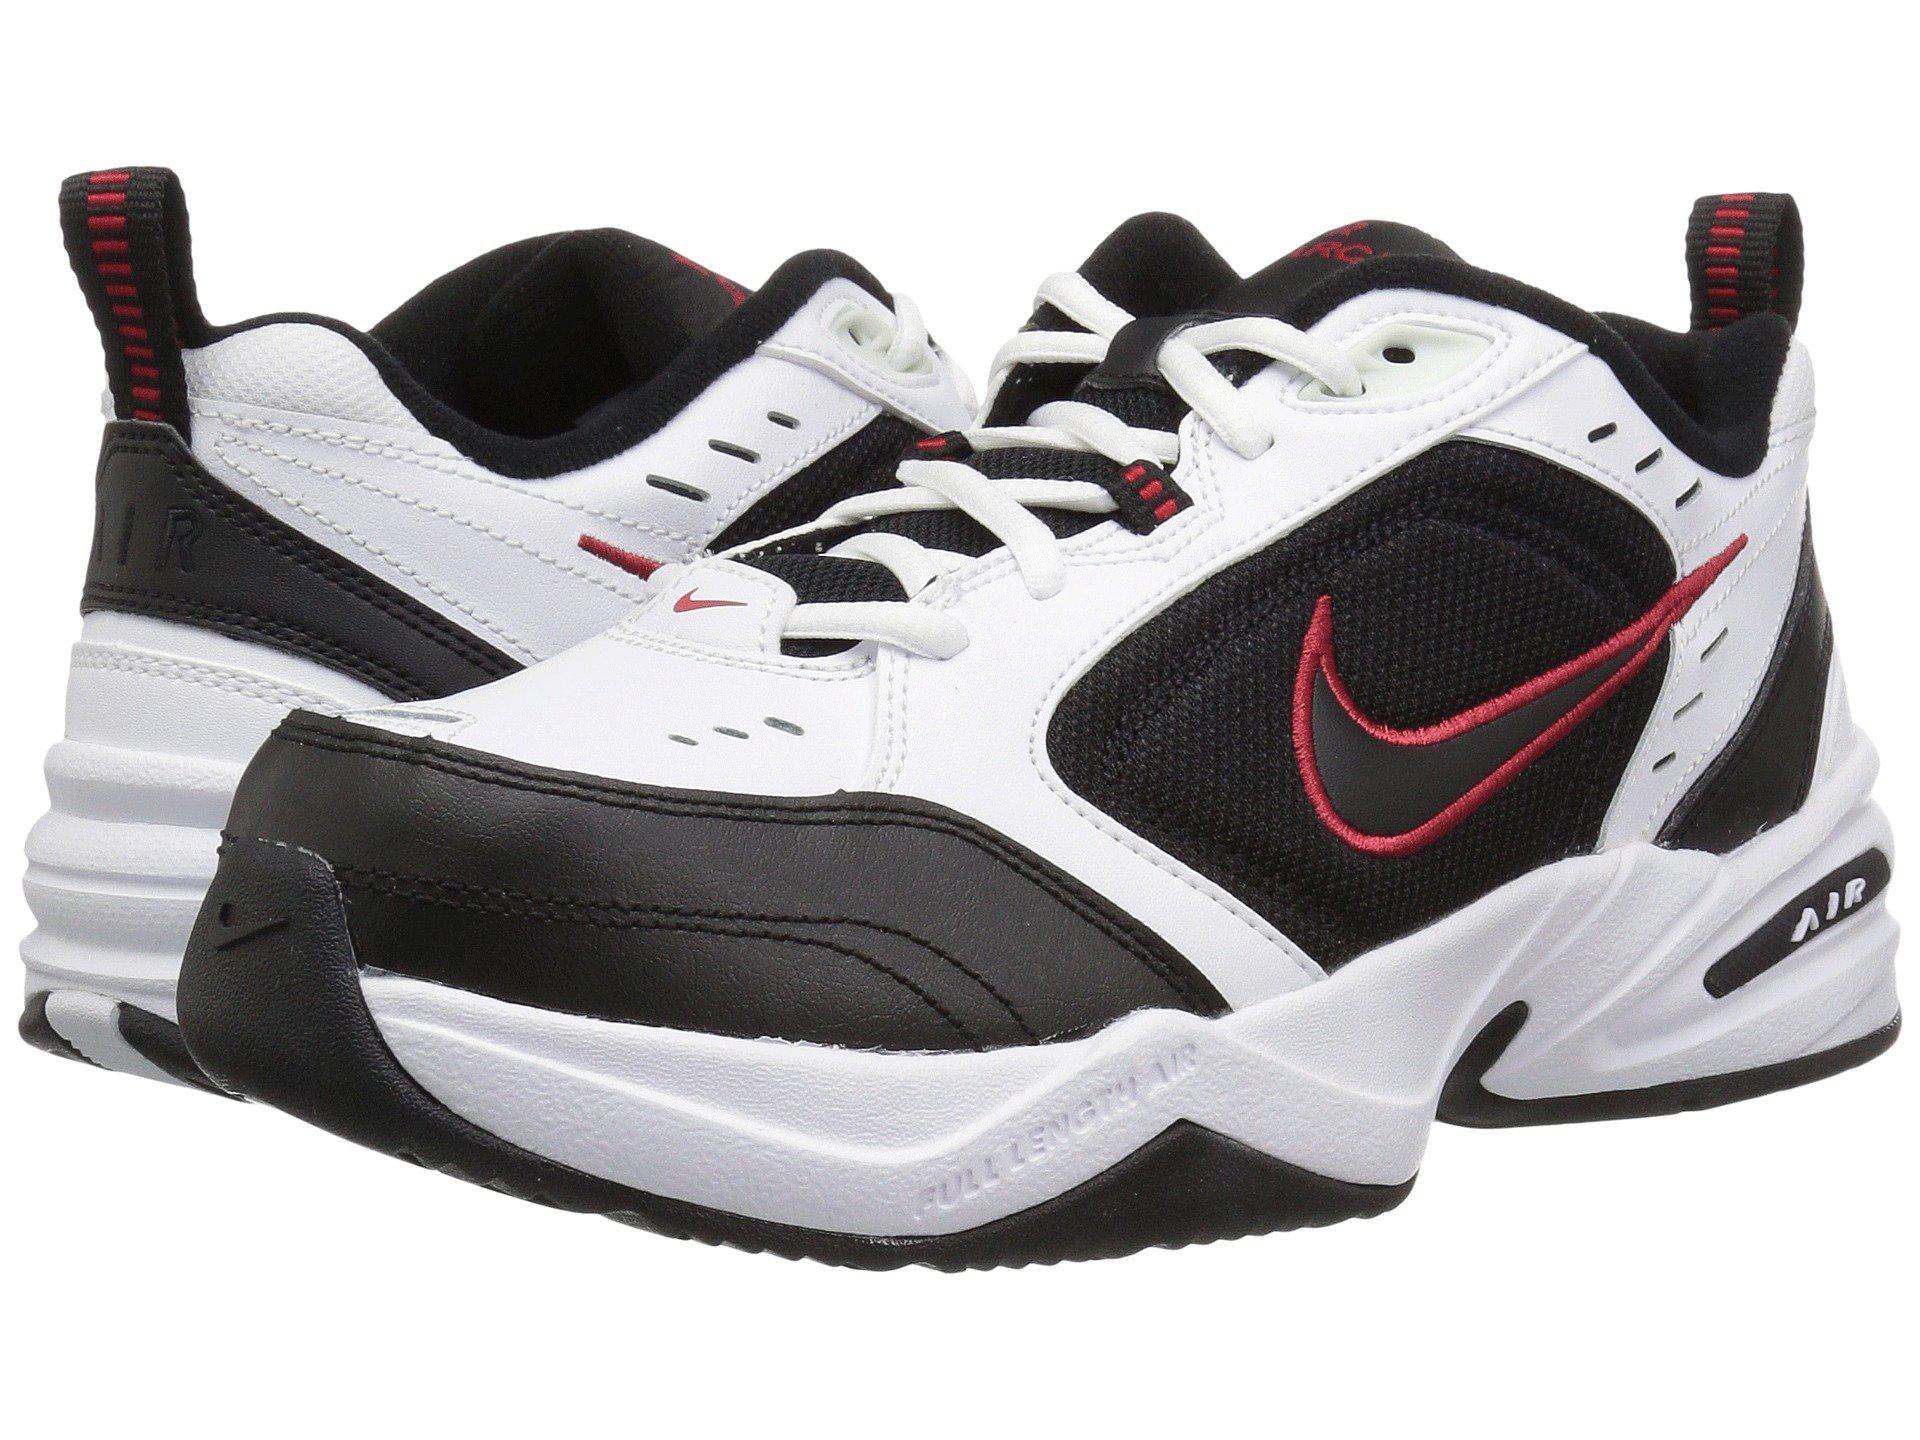 f1be4b82a8e17b Lyst - Nike Air Monarch Iv (black black) Men s Cross Training Shoes ...